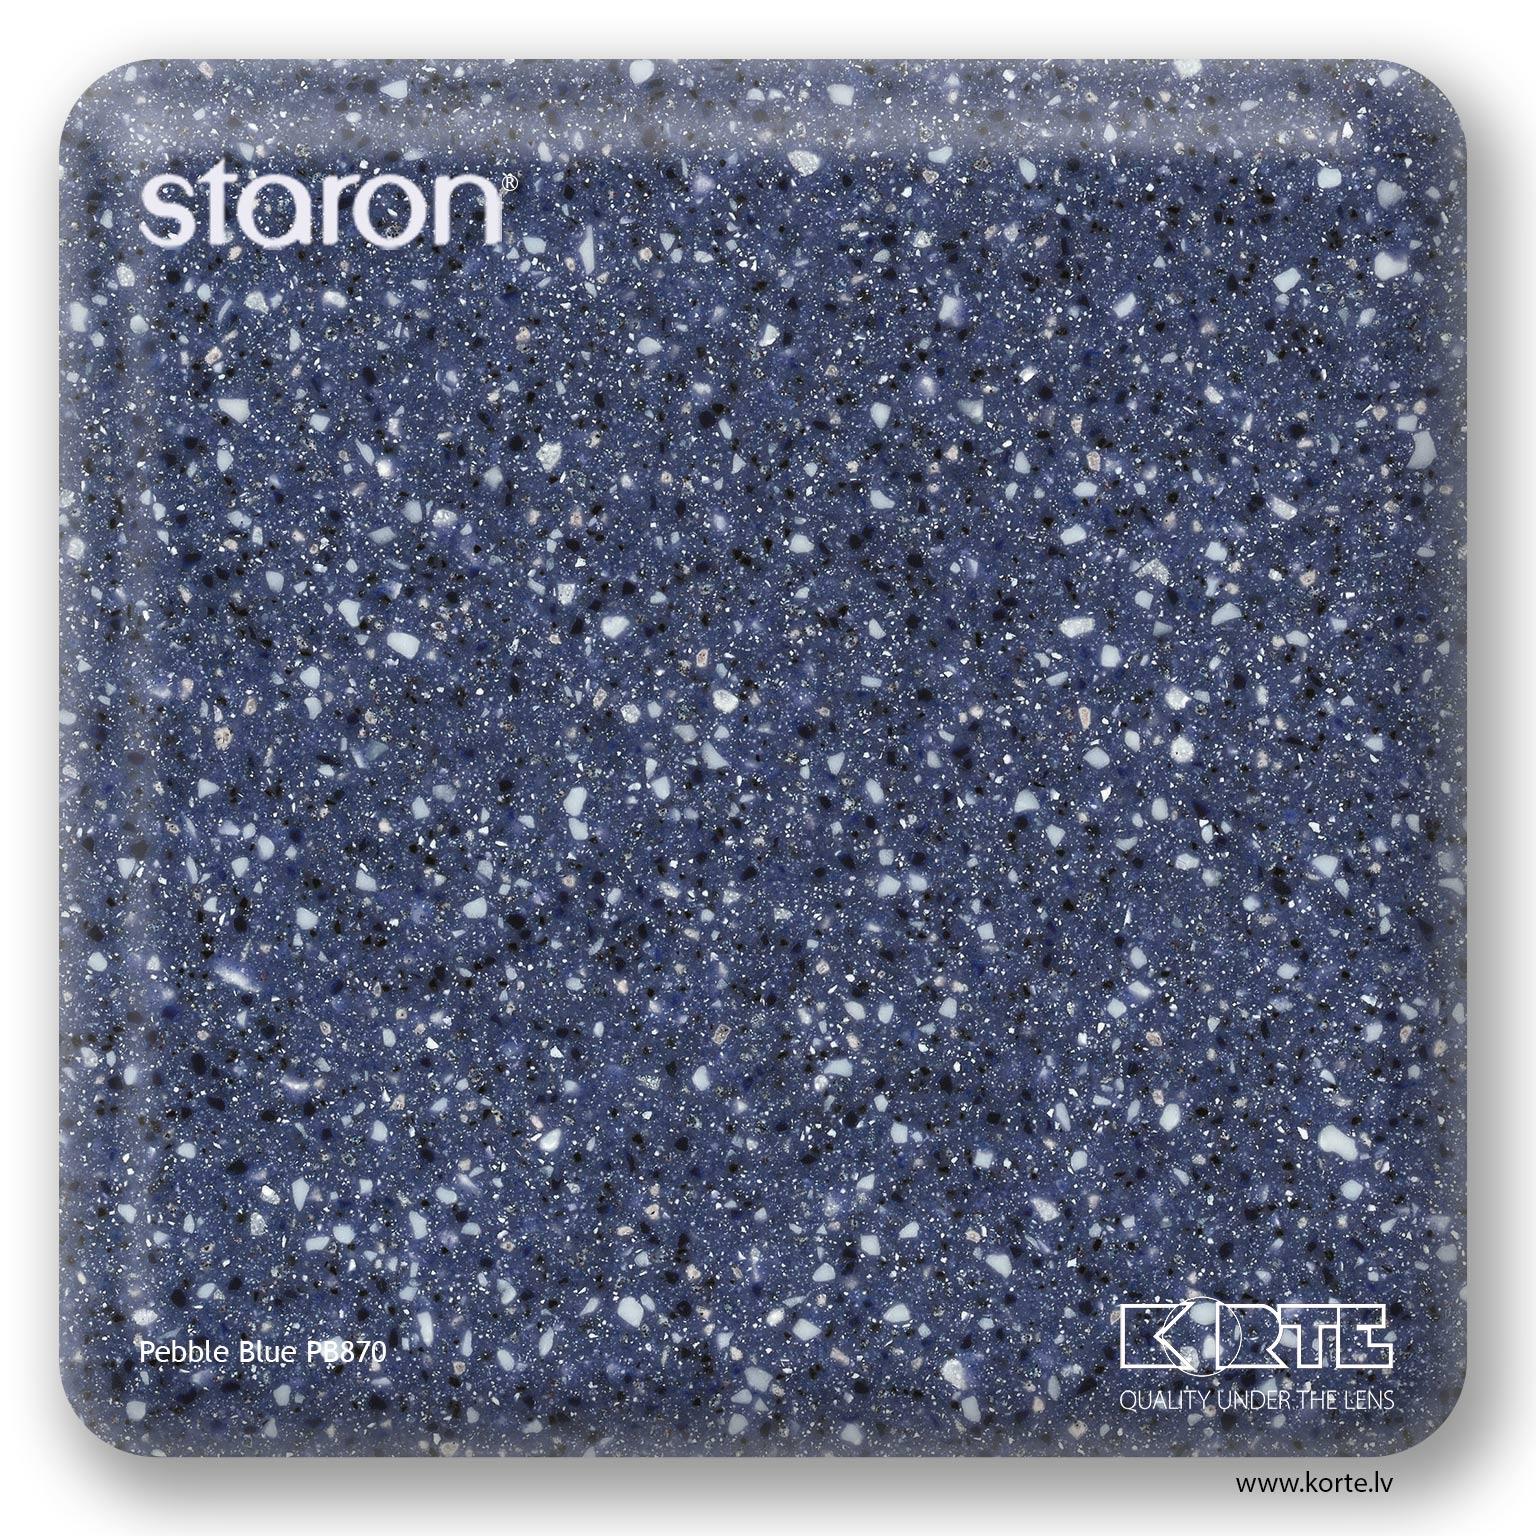 Staron Pebble Blue PB870